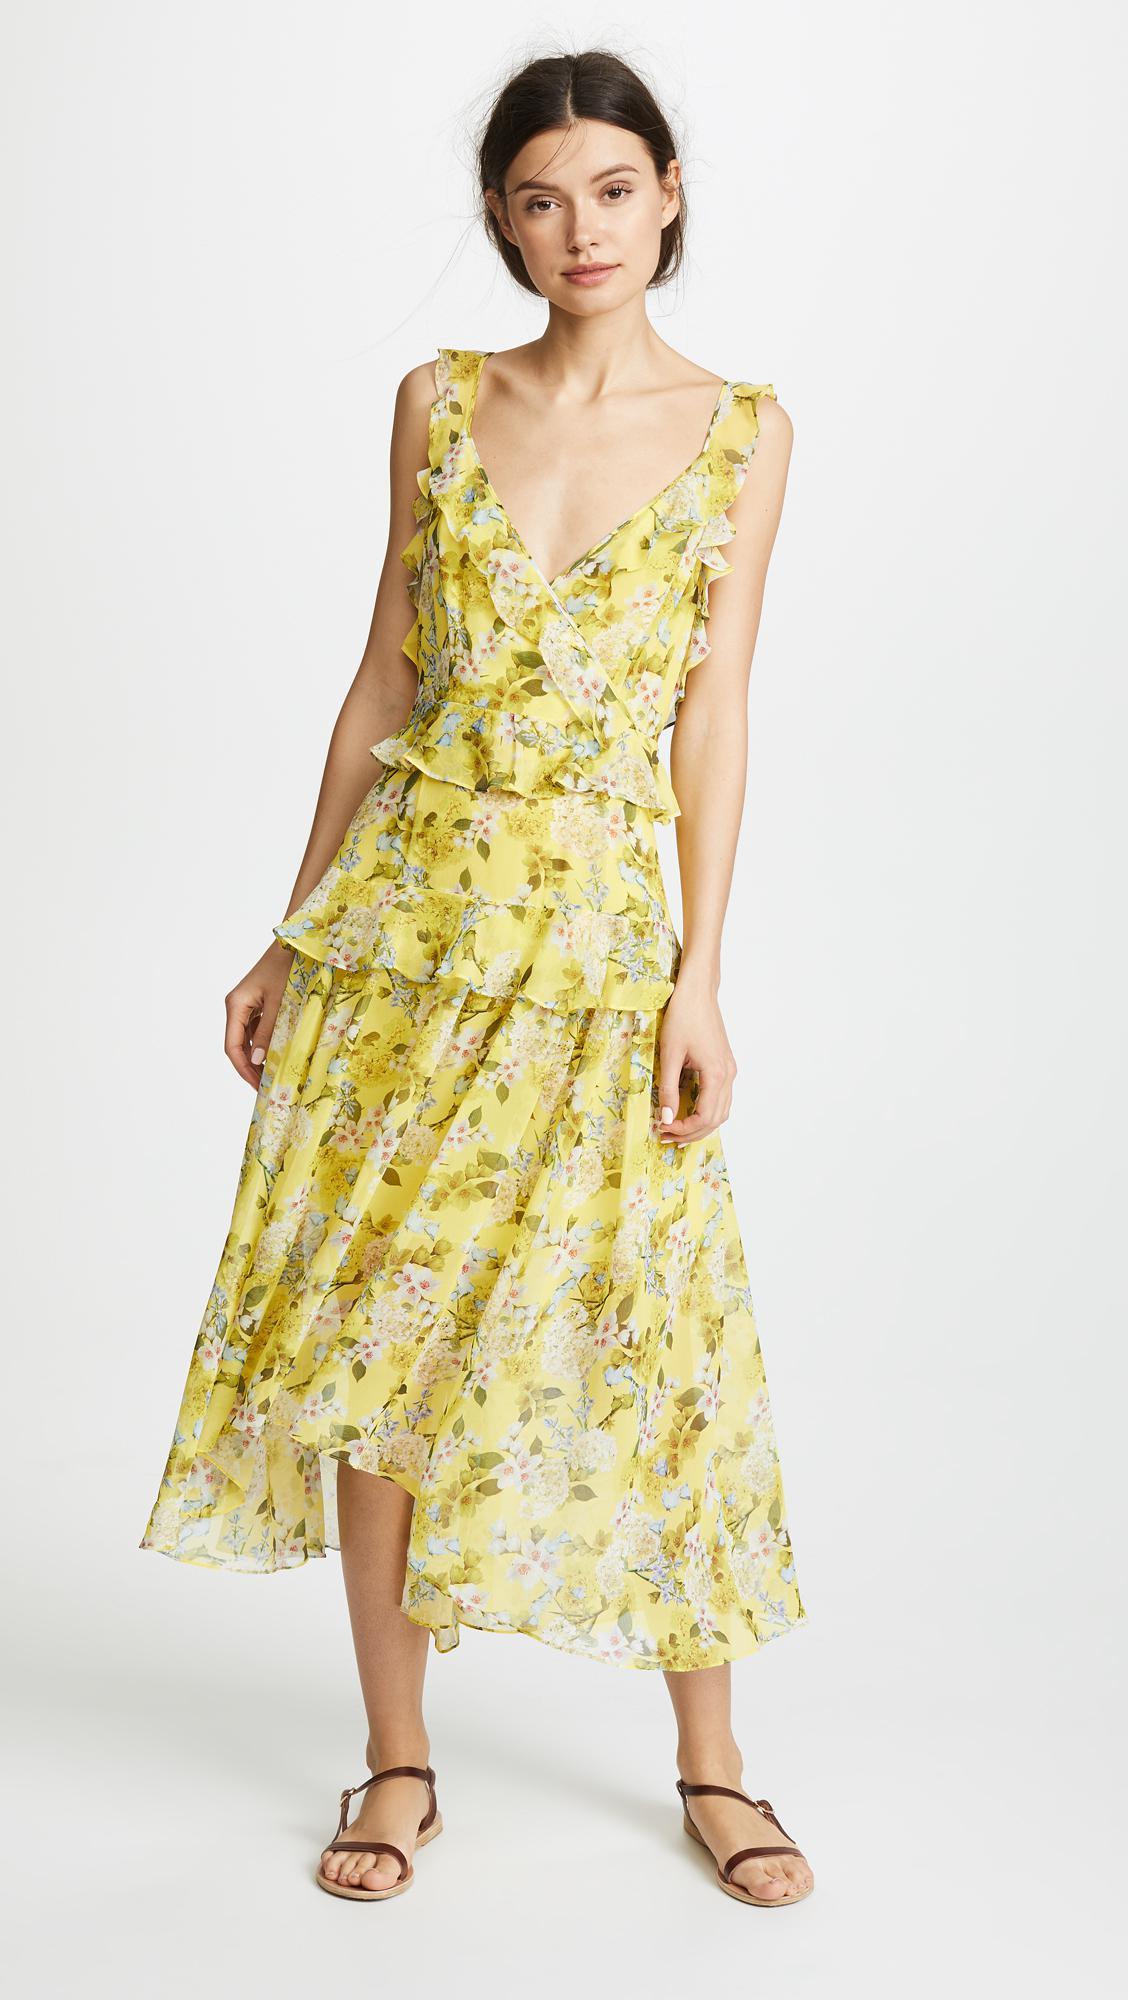 Fashionable Sale Online Everett Silk Print Dress Marissa Webb Really For Sale Buy Best j0Ag9